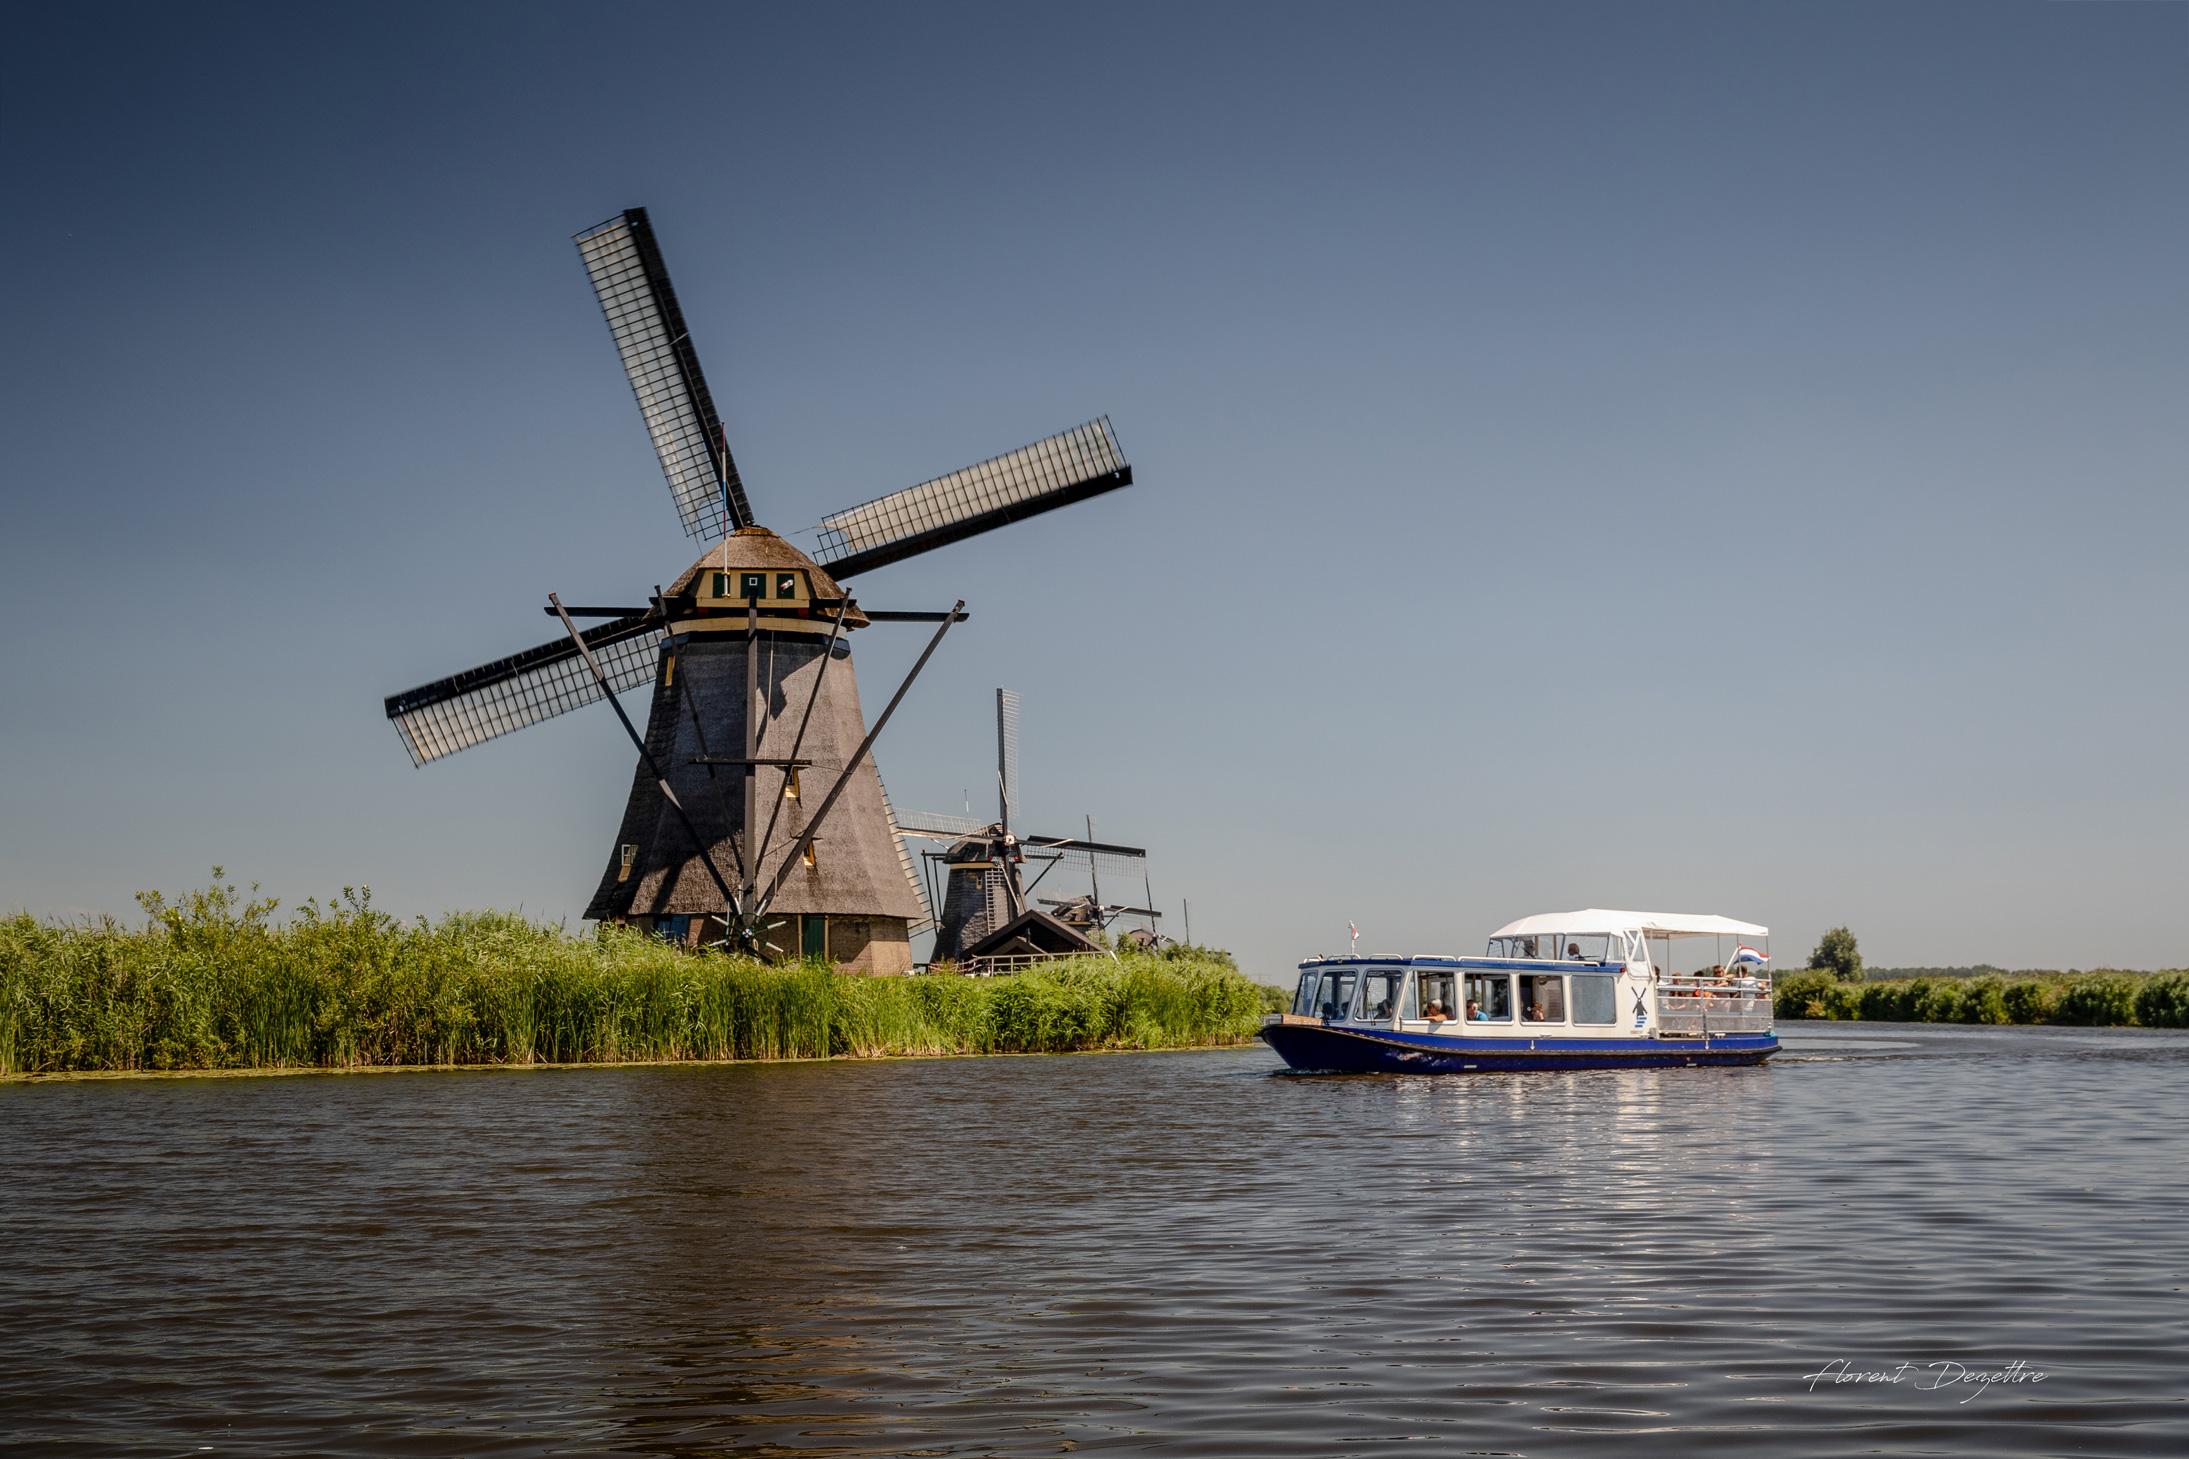 NL_2130